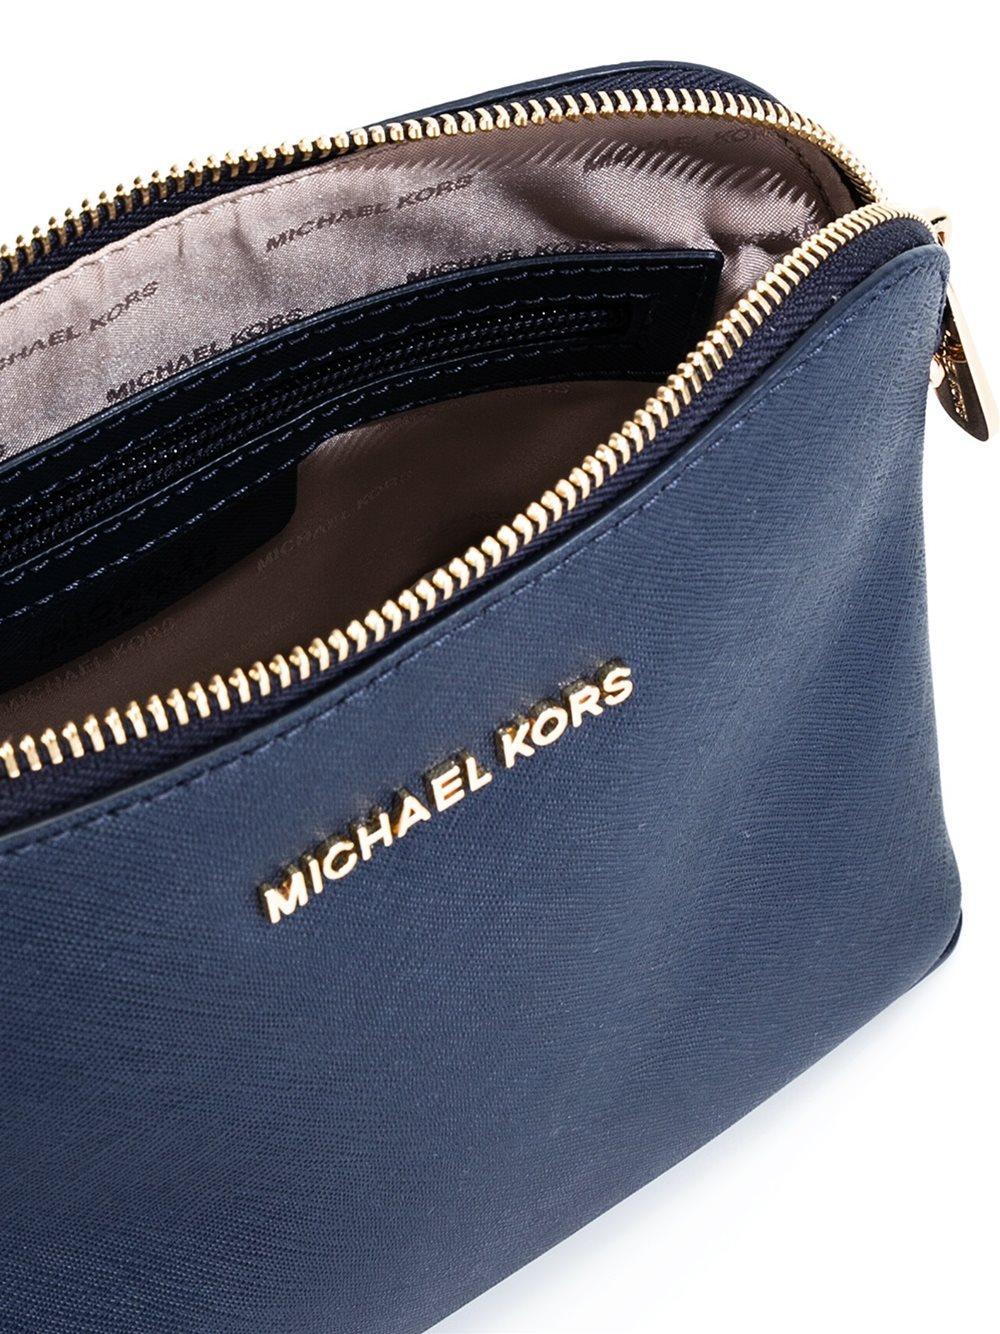 MICHAEL Michael Kors Leather Cindy Crossbody Bag